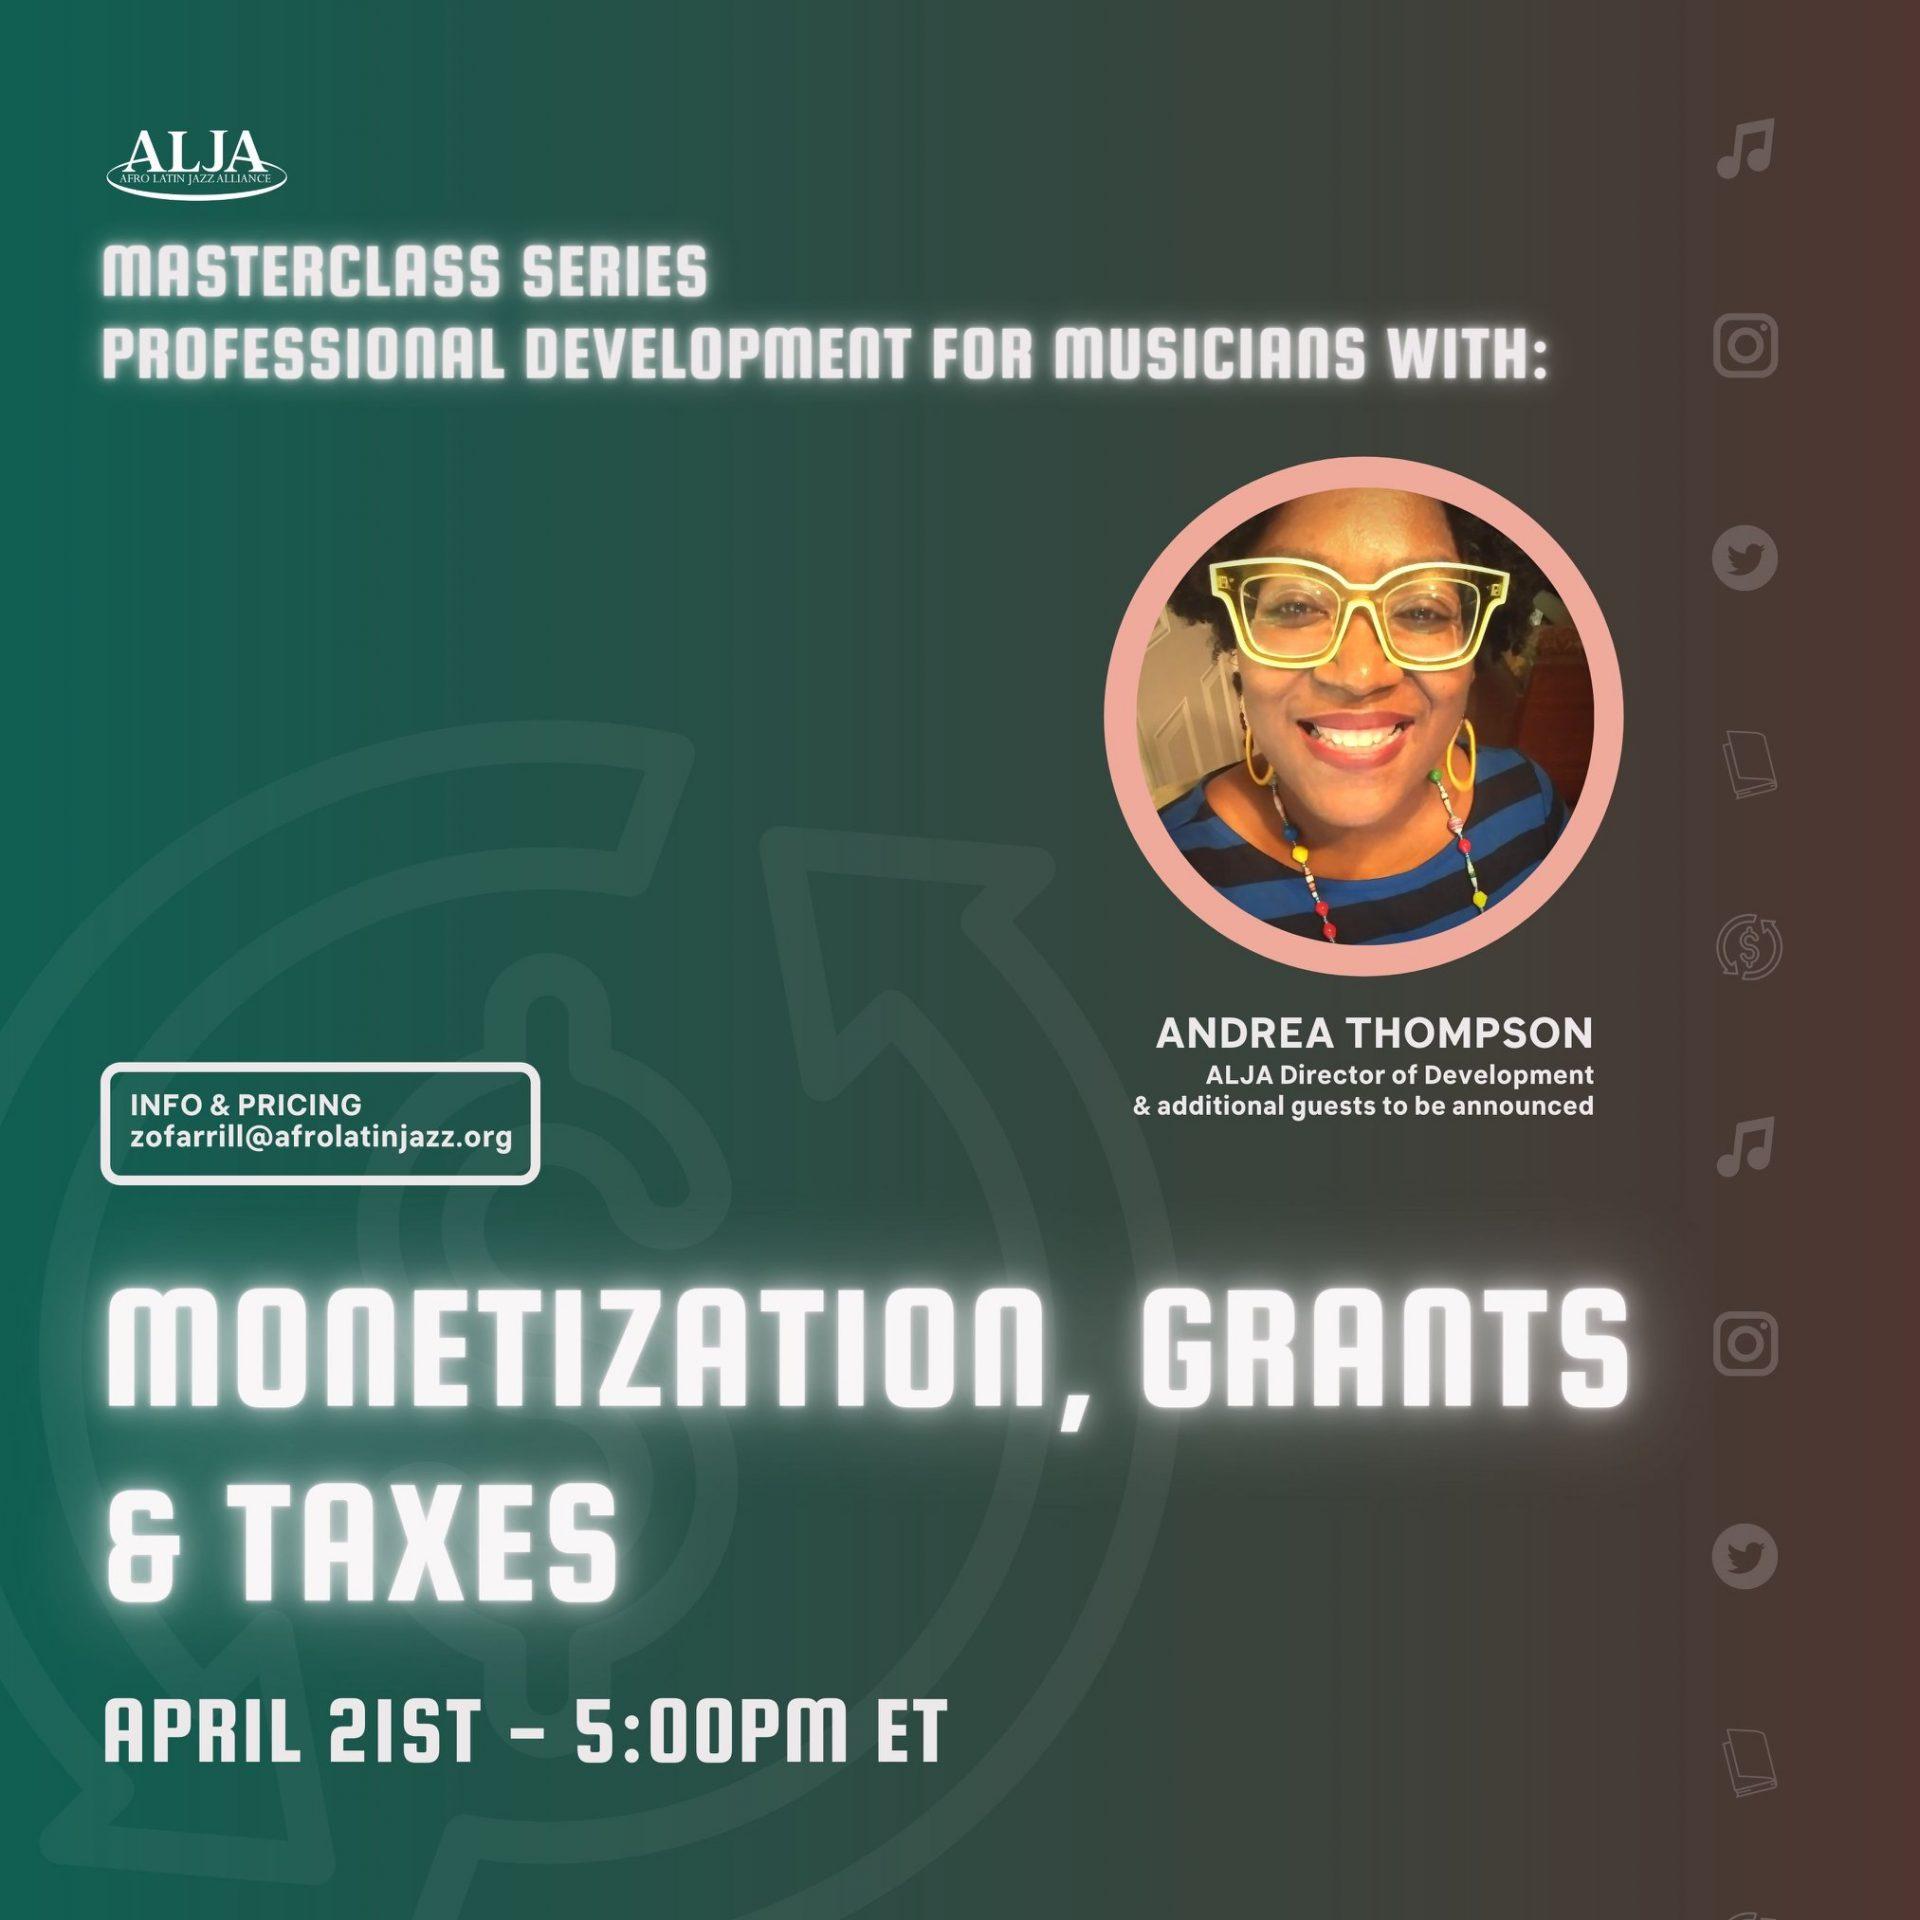 Masterclass SeriesProfessional Development SeriesMonetization + Grants + TaxesWEDNESDAY, APRIL 21, 2021 @ 5:00 pm EST | 4:00 pm CST | 2:00 pm PST